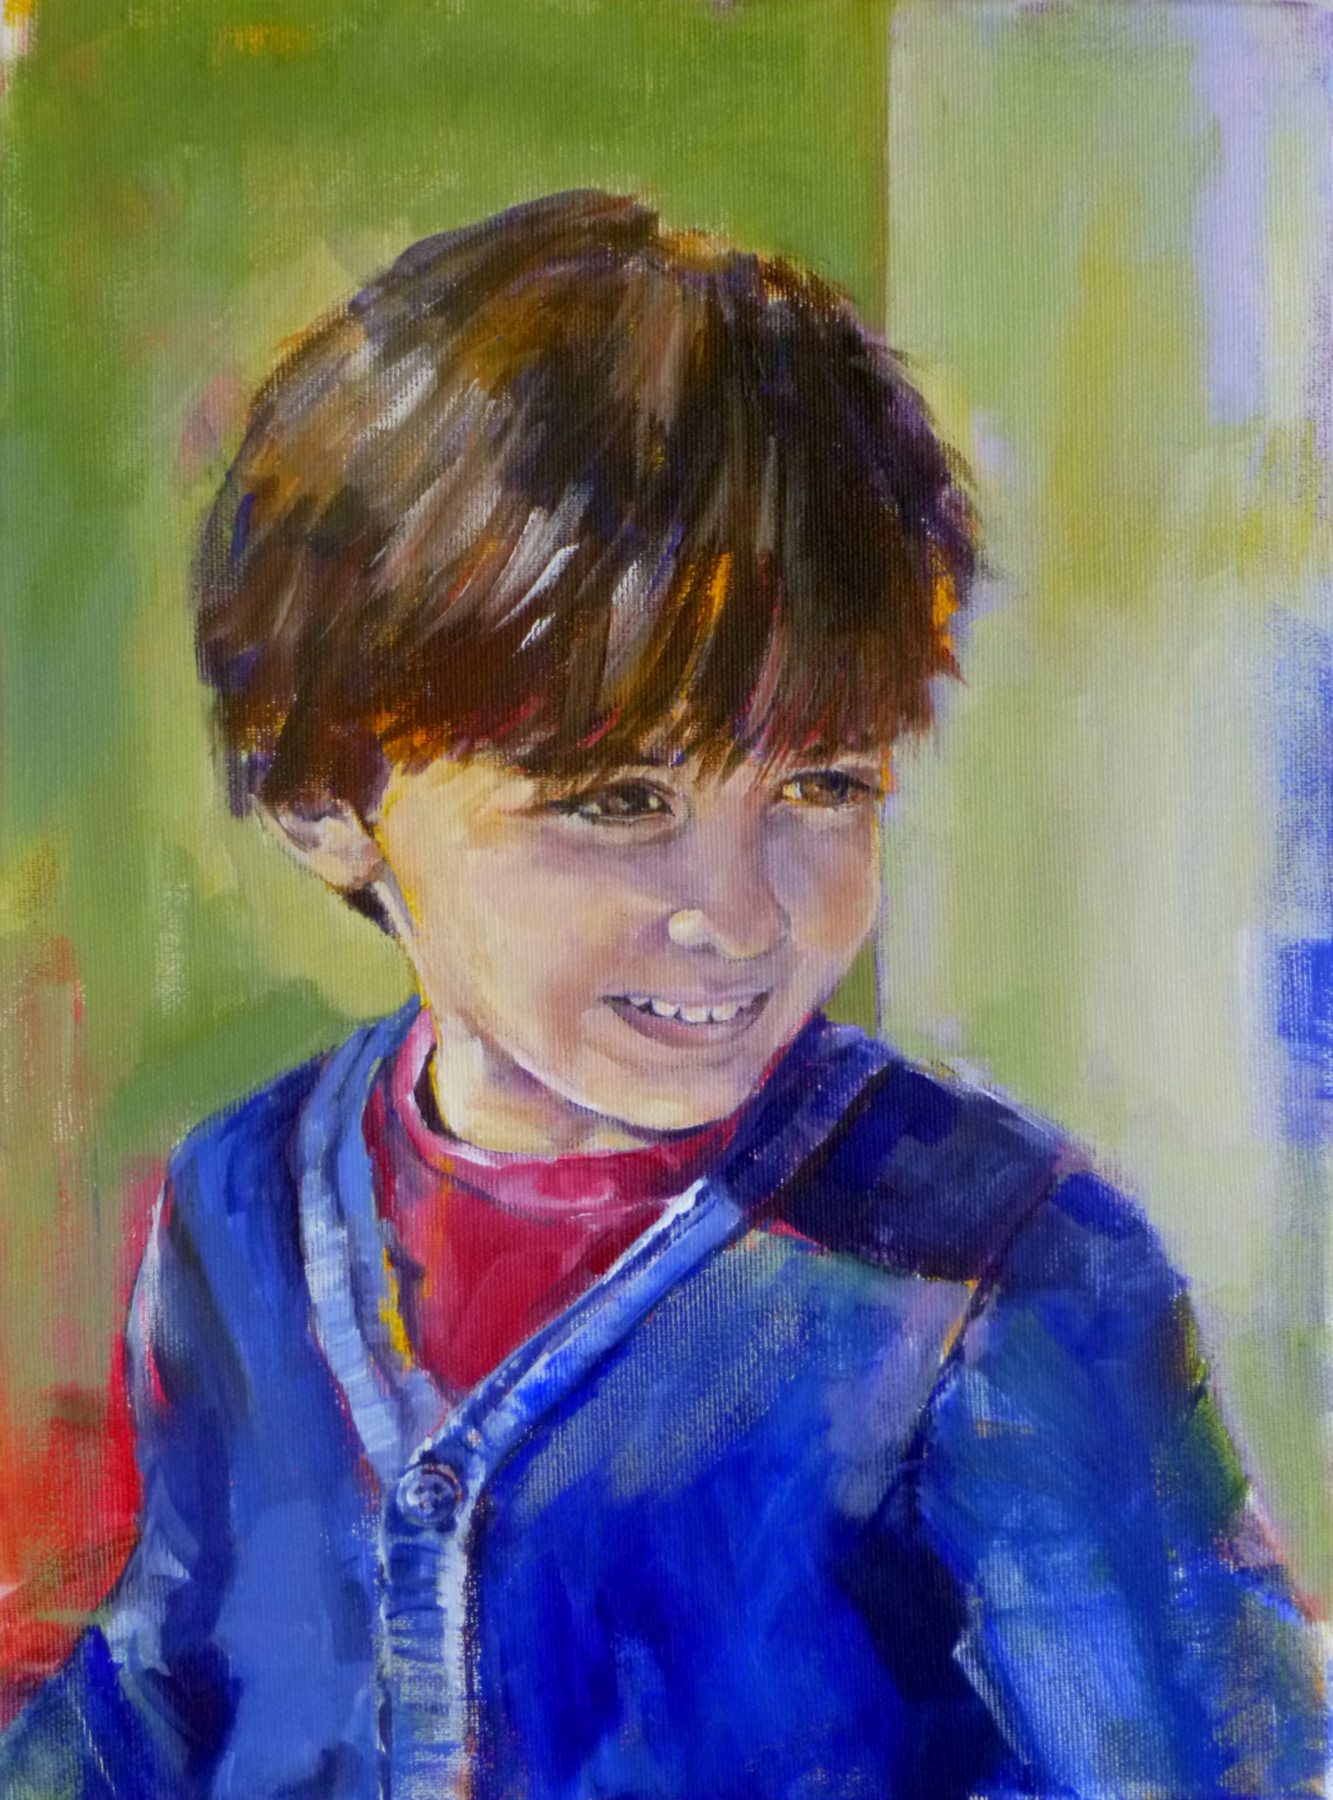 Viktor, Painting. Acrylic on Canvas by Neva Bergemann, artist